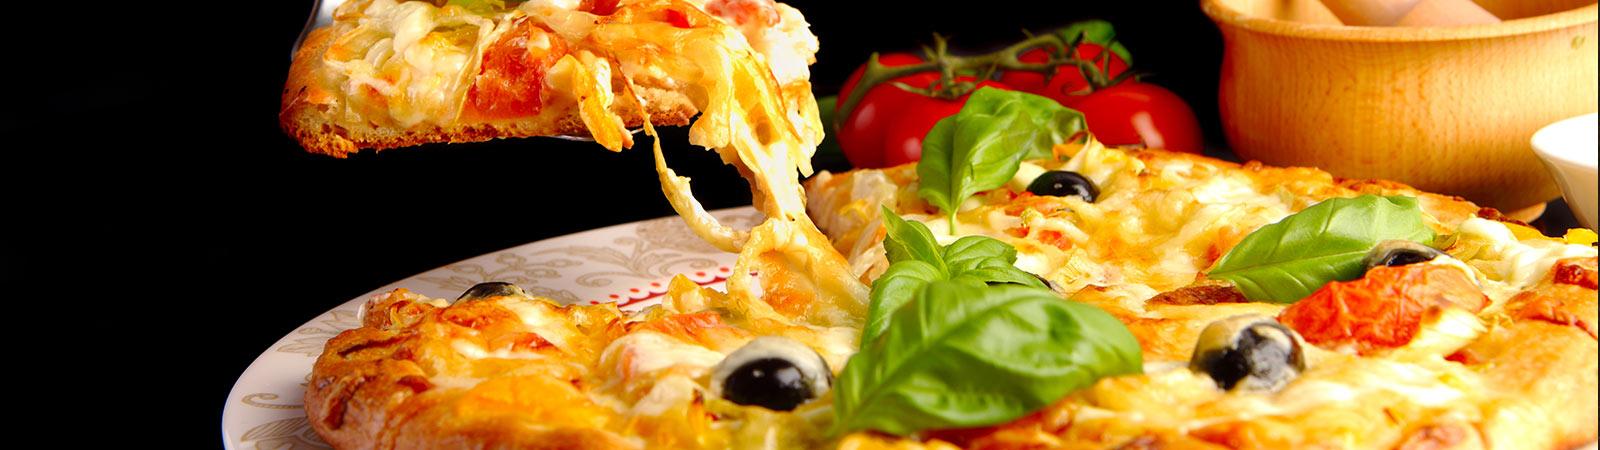 La Pizzeria La Pizzeria Newport Uk Takeaway Order Online